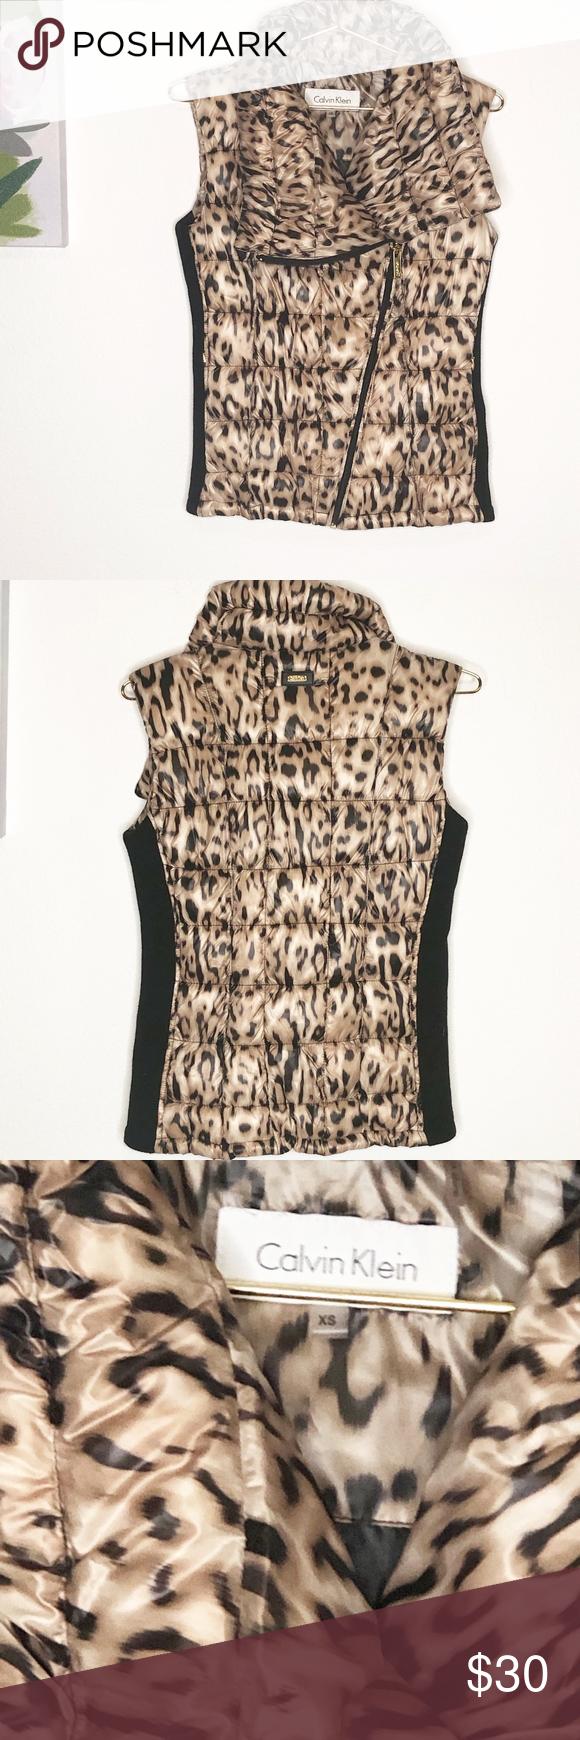 Calvin klein leopard puff vest xs in my posh closet